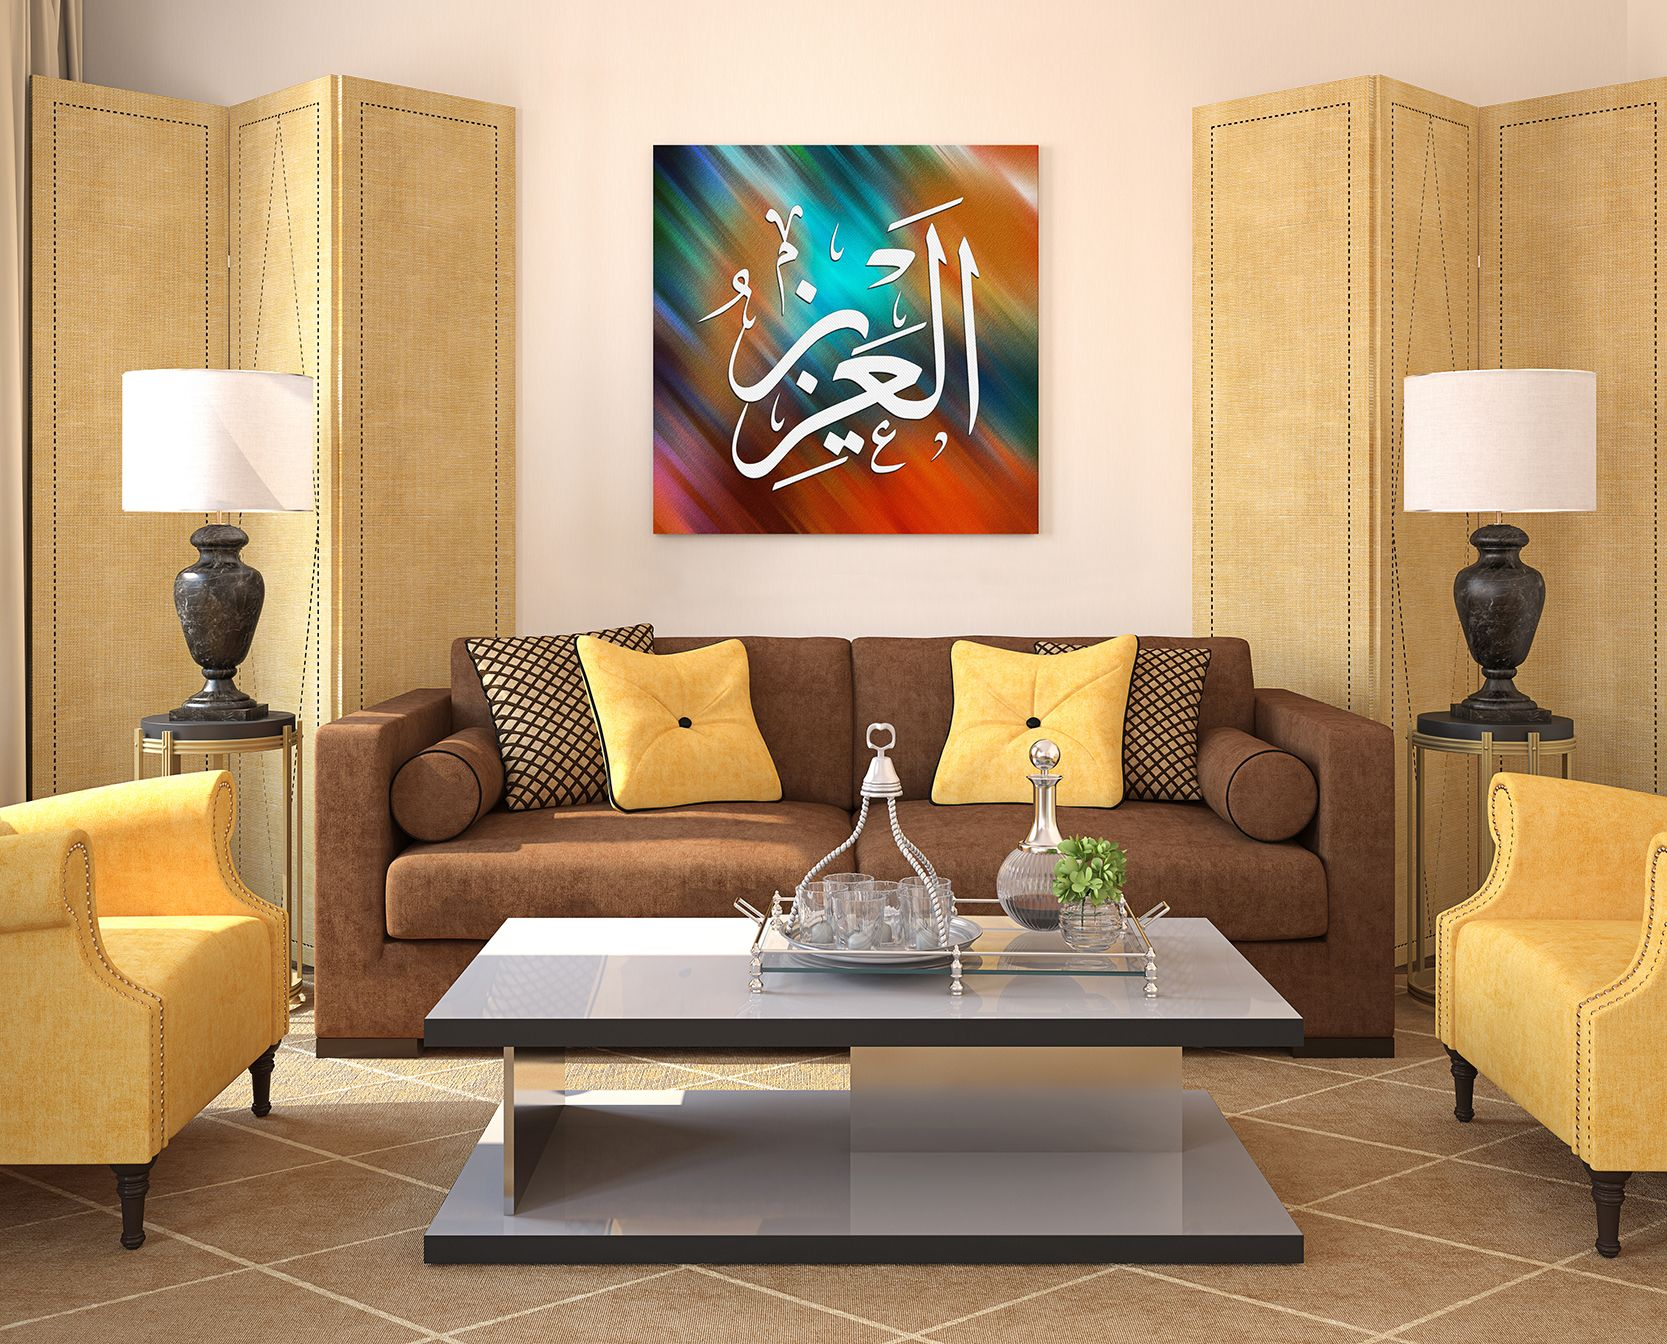 Al Aziz Calligraphy Asma Ul Husna Arabic Art On Canvas